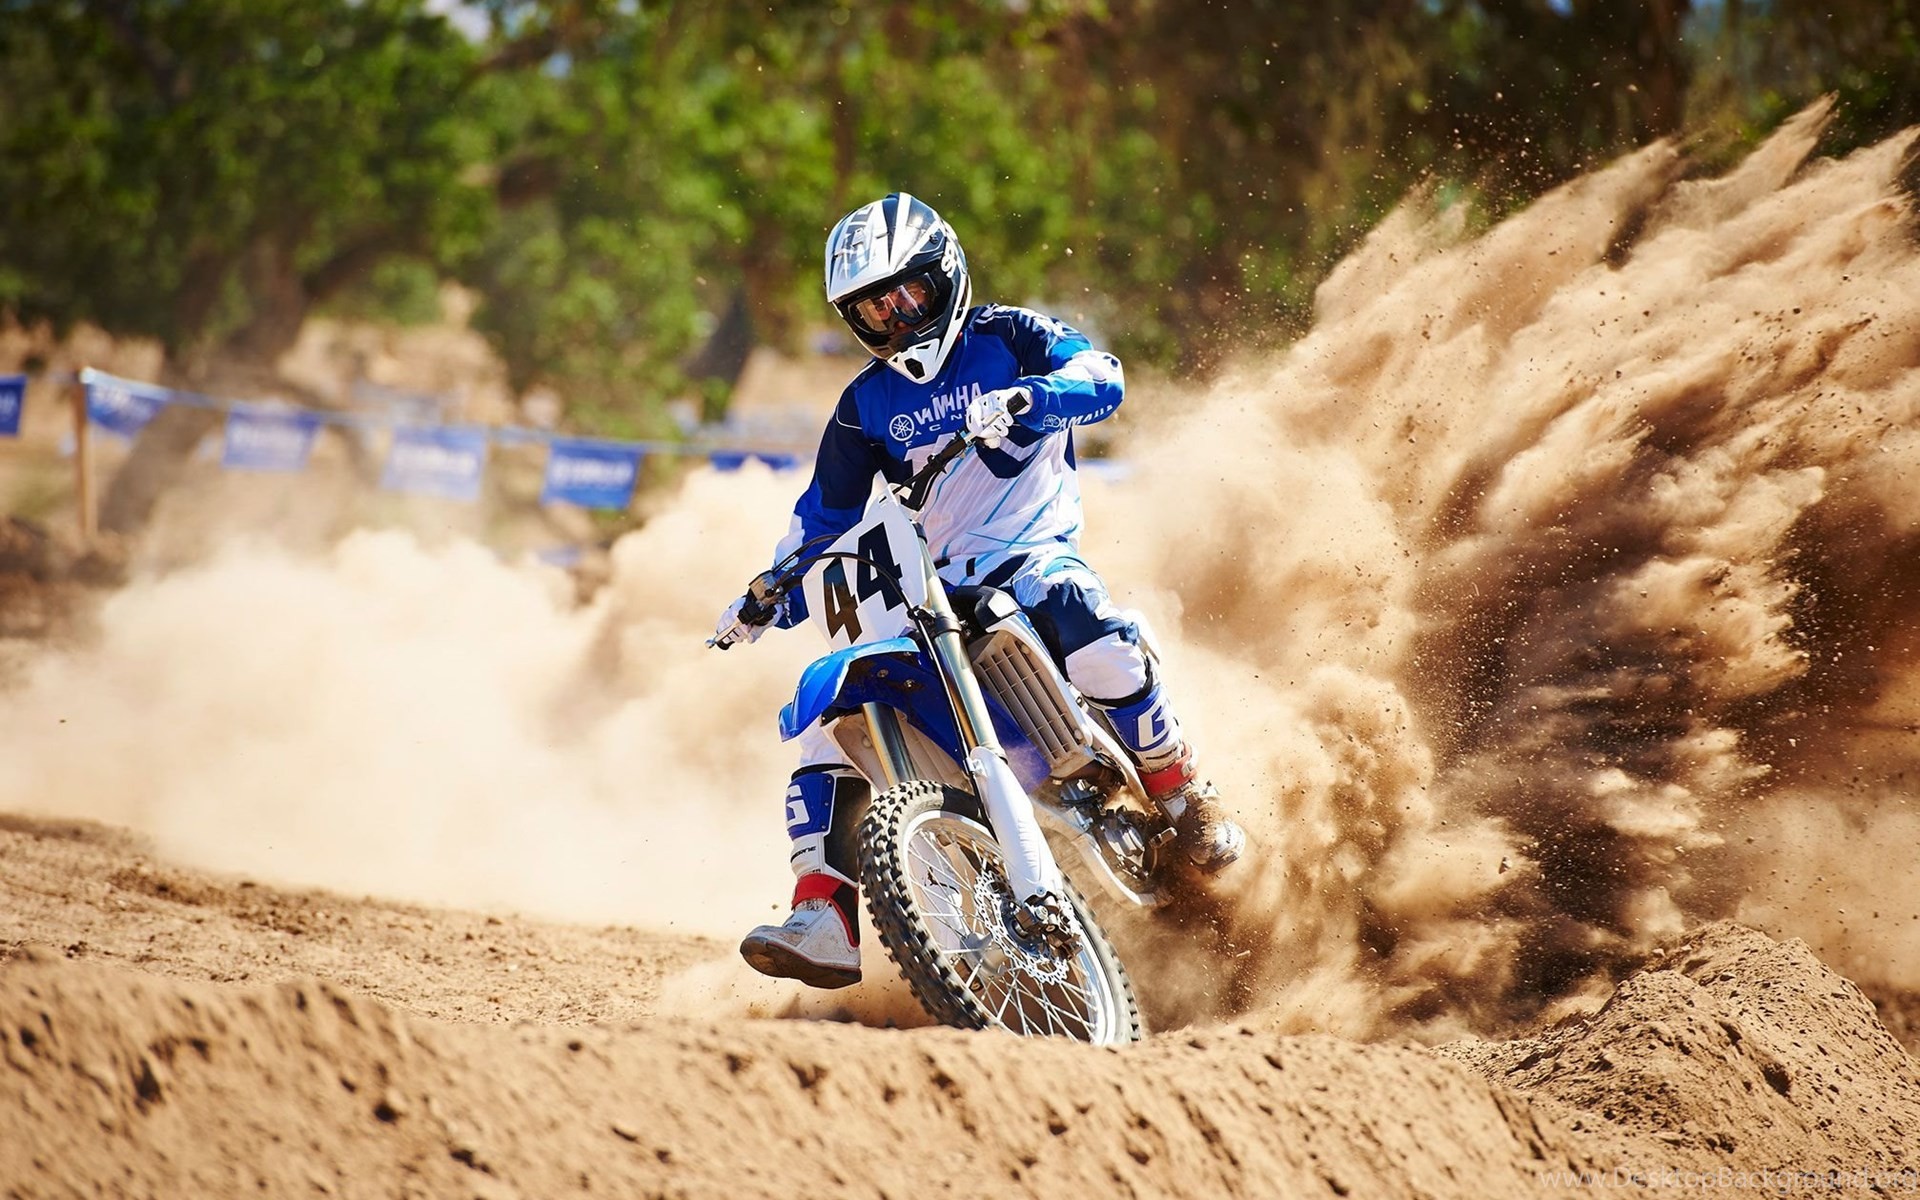 Kawasaki Dirt Bikes Wallpapers Wallpaper  Desktop Background